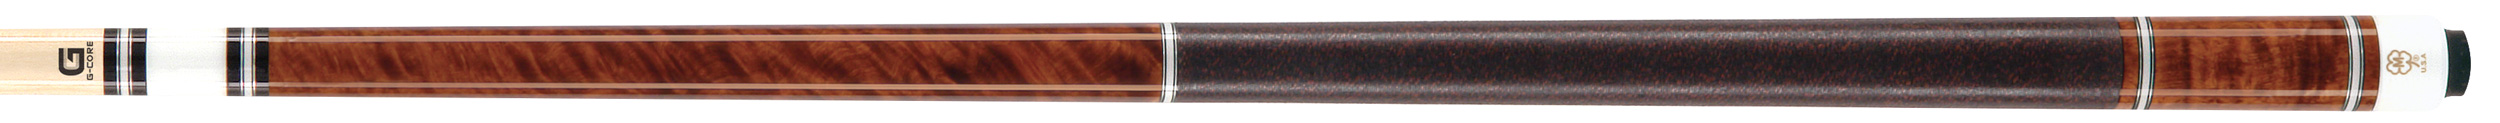 Mcdermott g236 mod. 2015 piljardikii